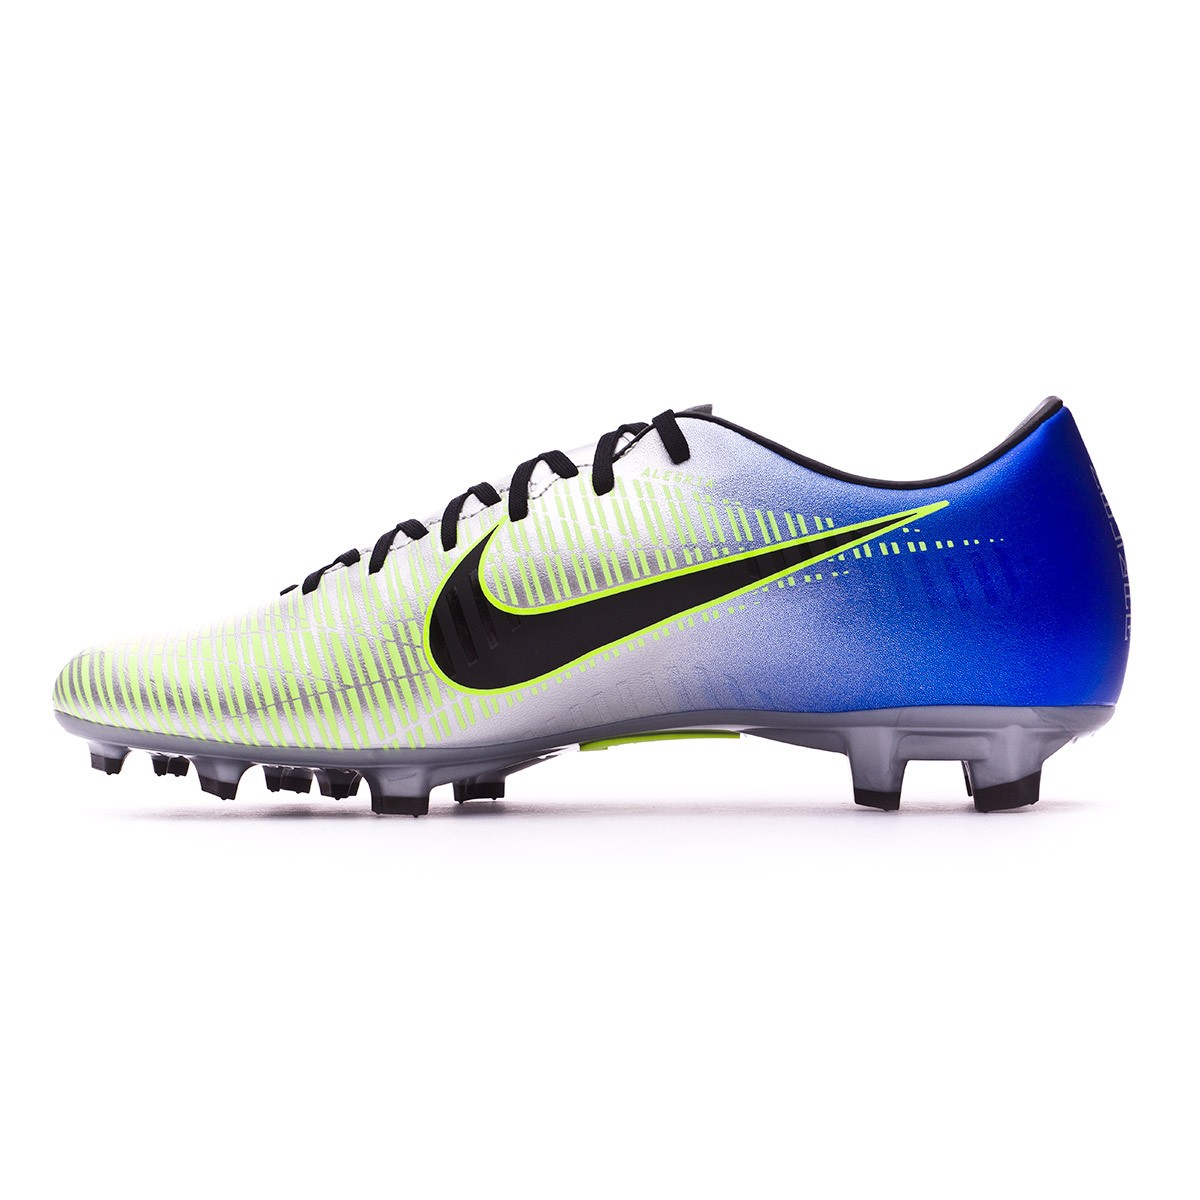 a2e81711018 Football Boots Nike Mercurial Victory VI FG Neymar Racer blue-Black-Chrome- Volt - Tienda de fútbol Fútbol Emotion